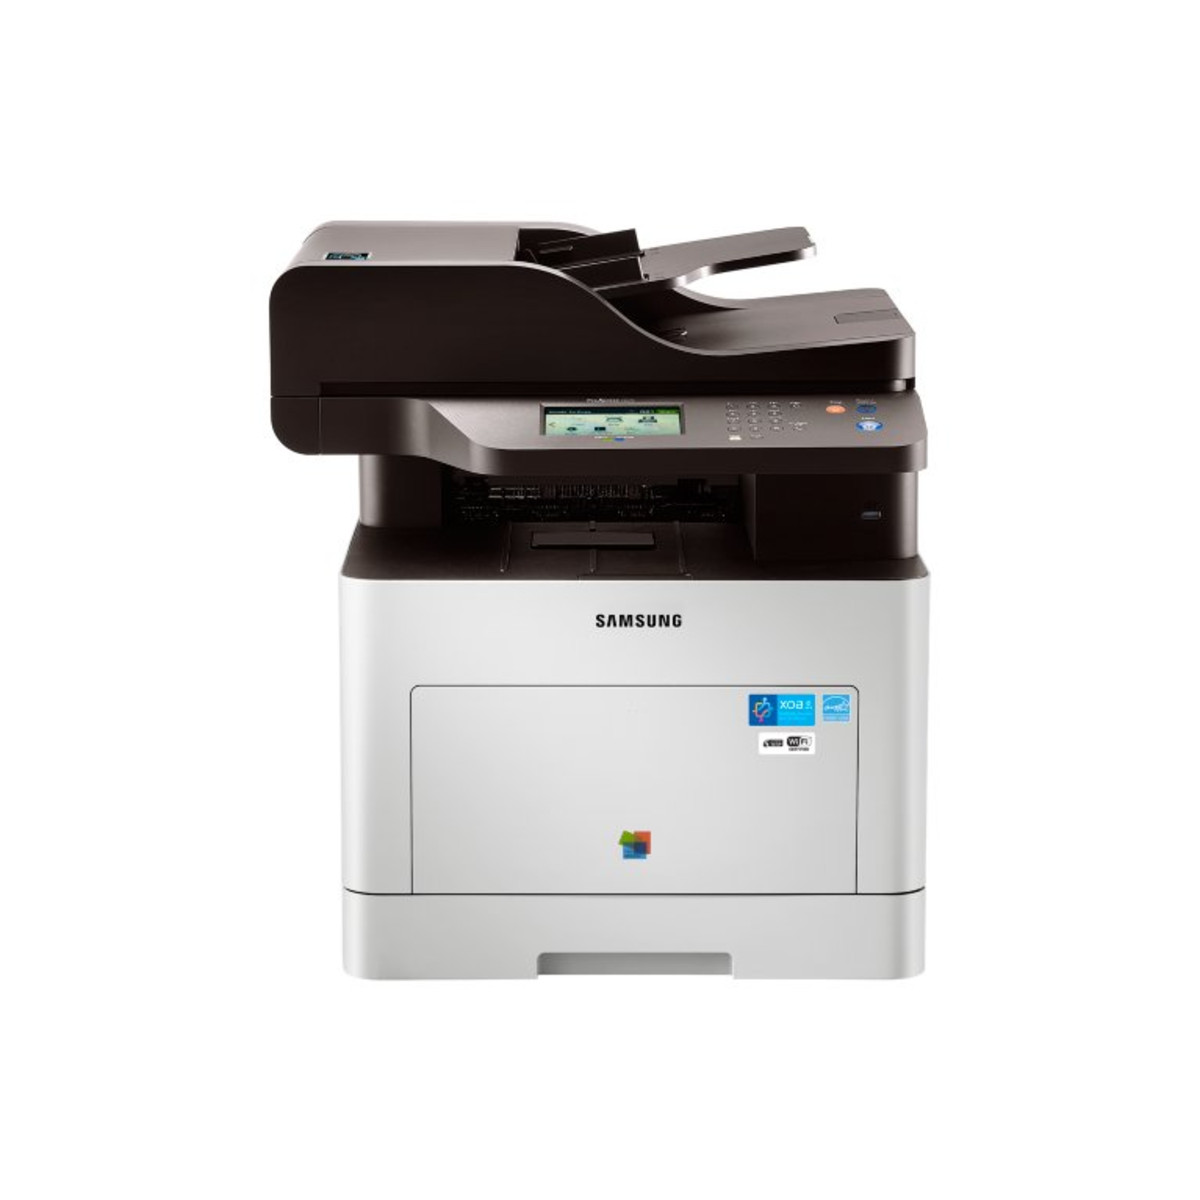 Samsung ProXpress SL-C2670FW Colour Laser Printer